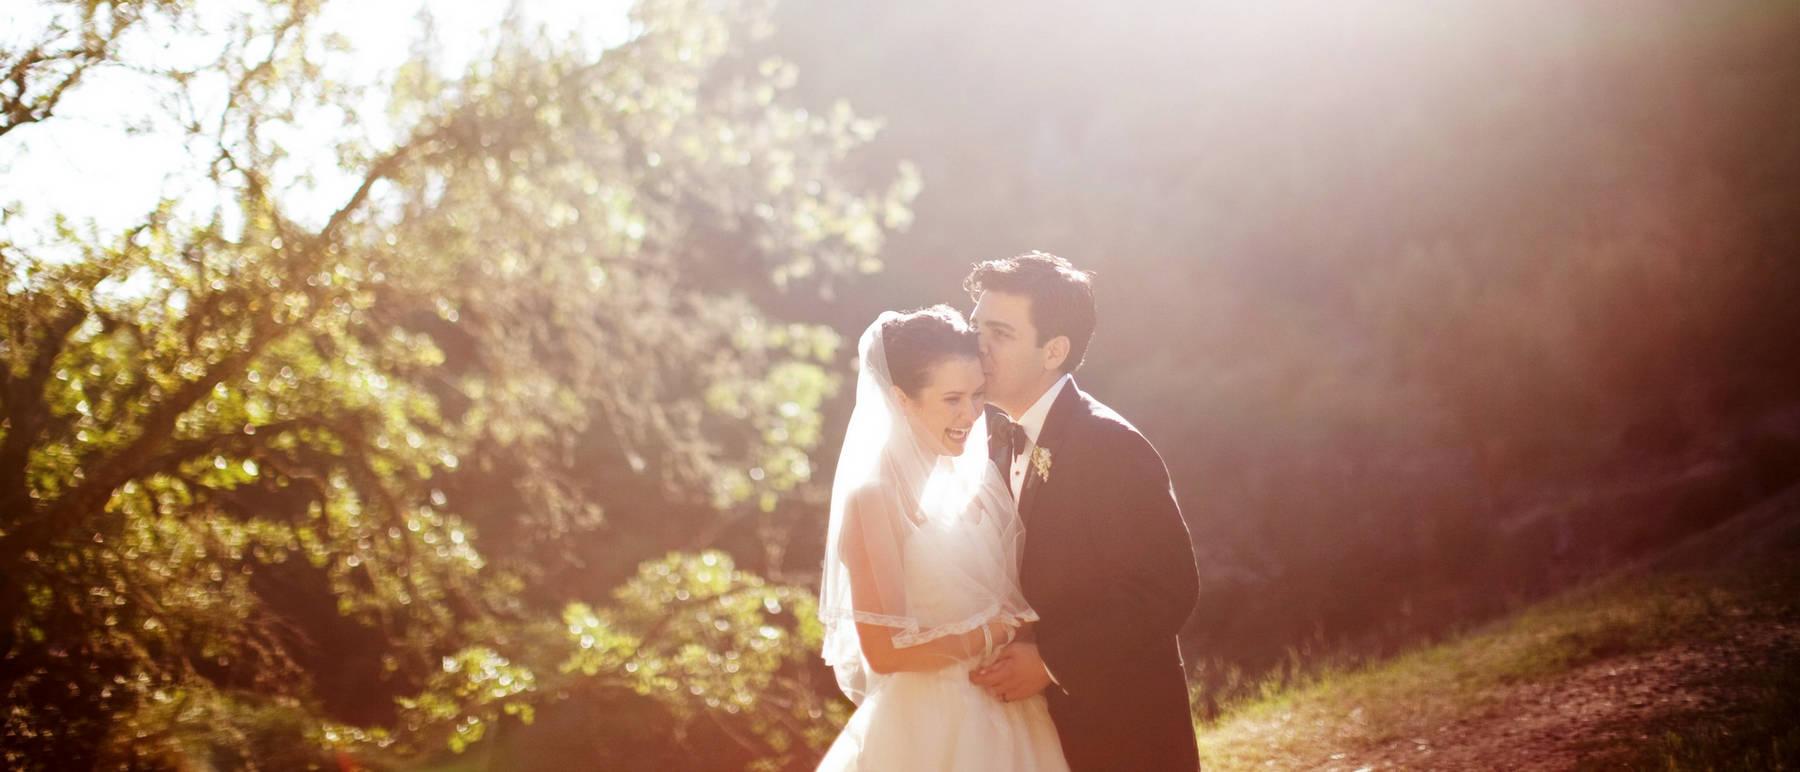 johnandjoseph-wedding-photographer-hz-slider-236